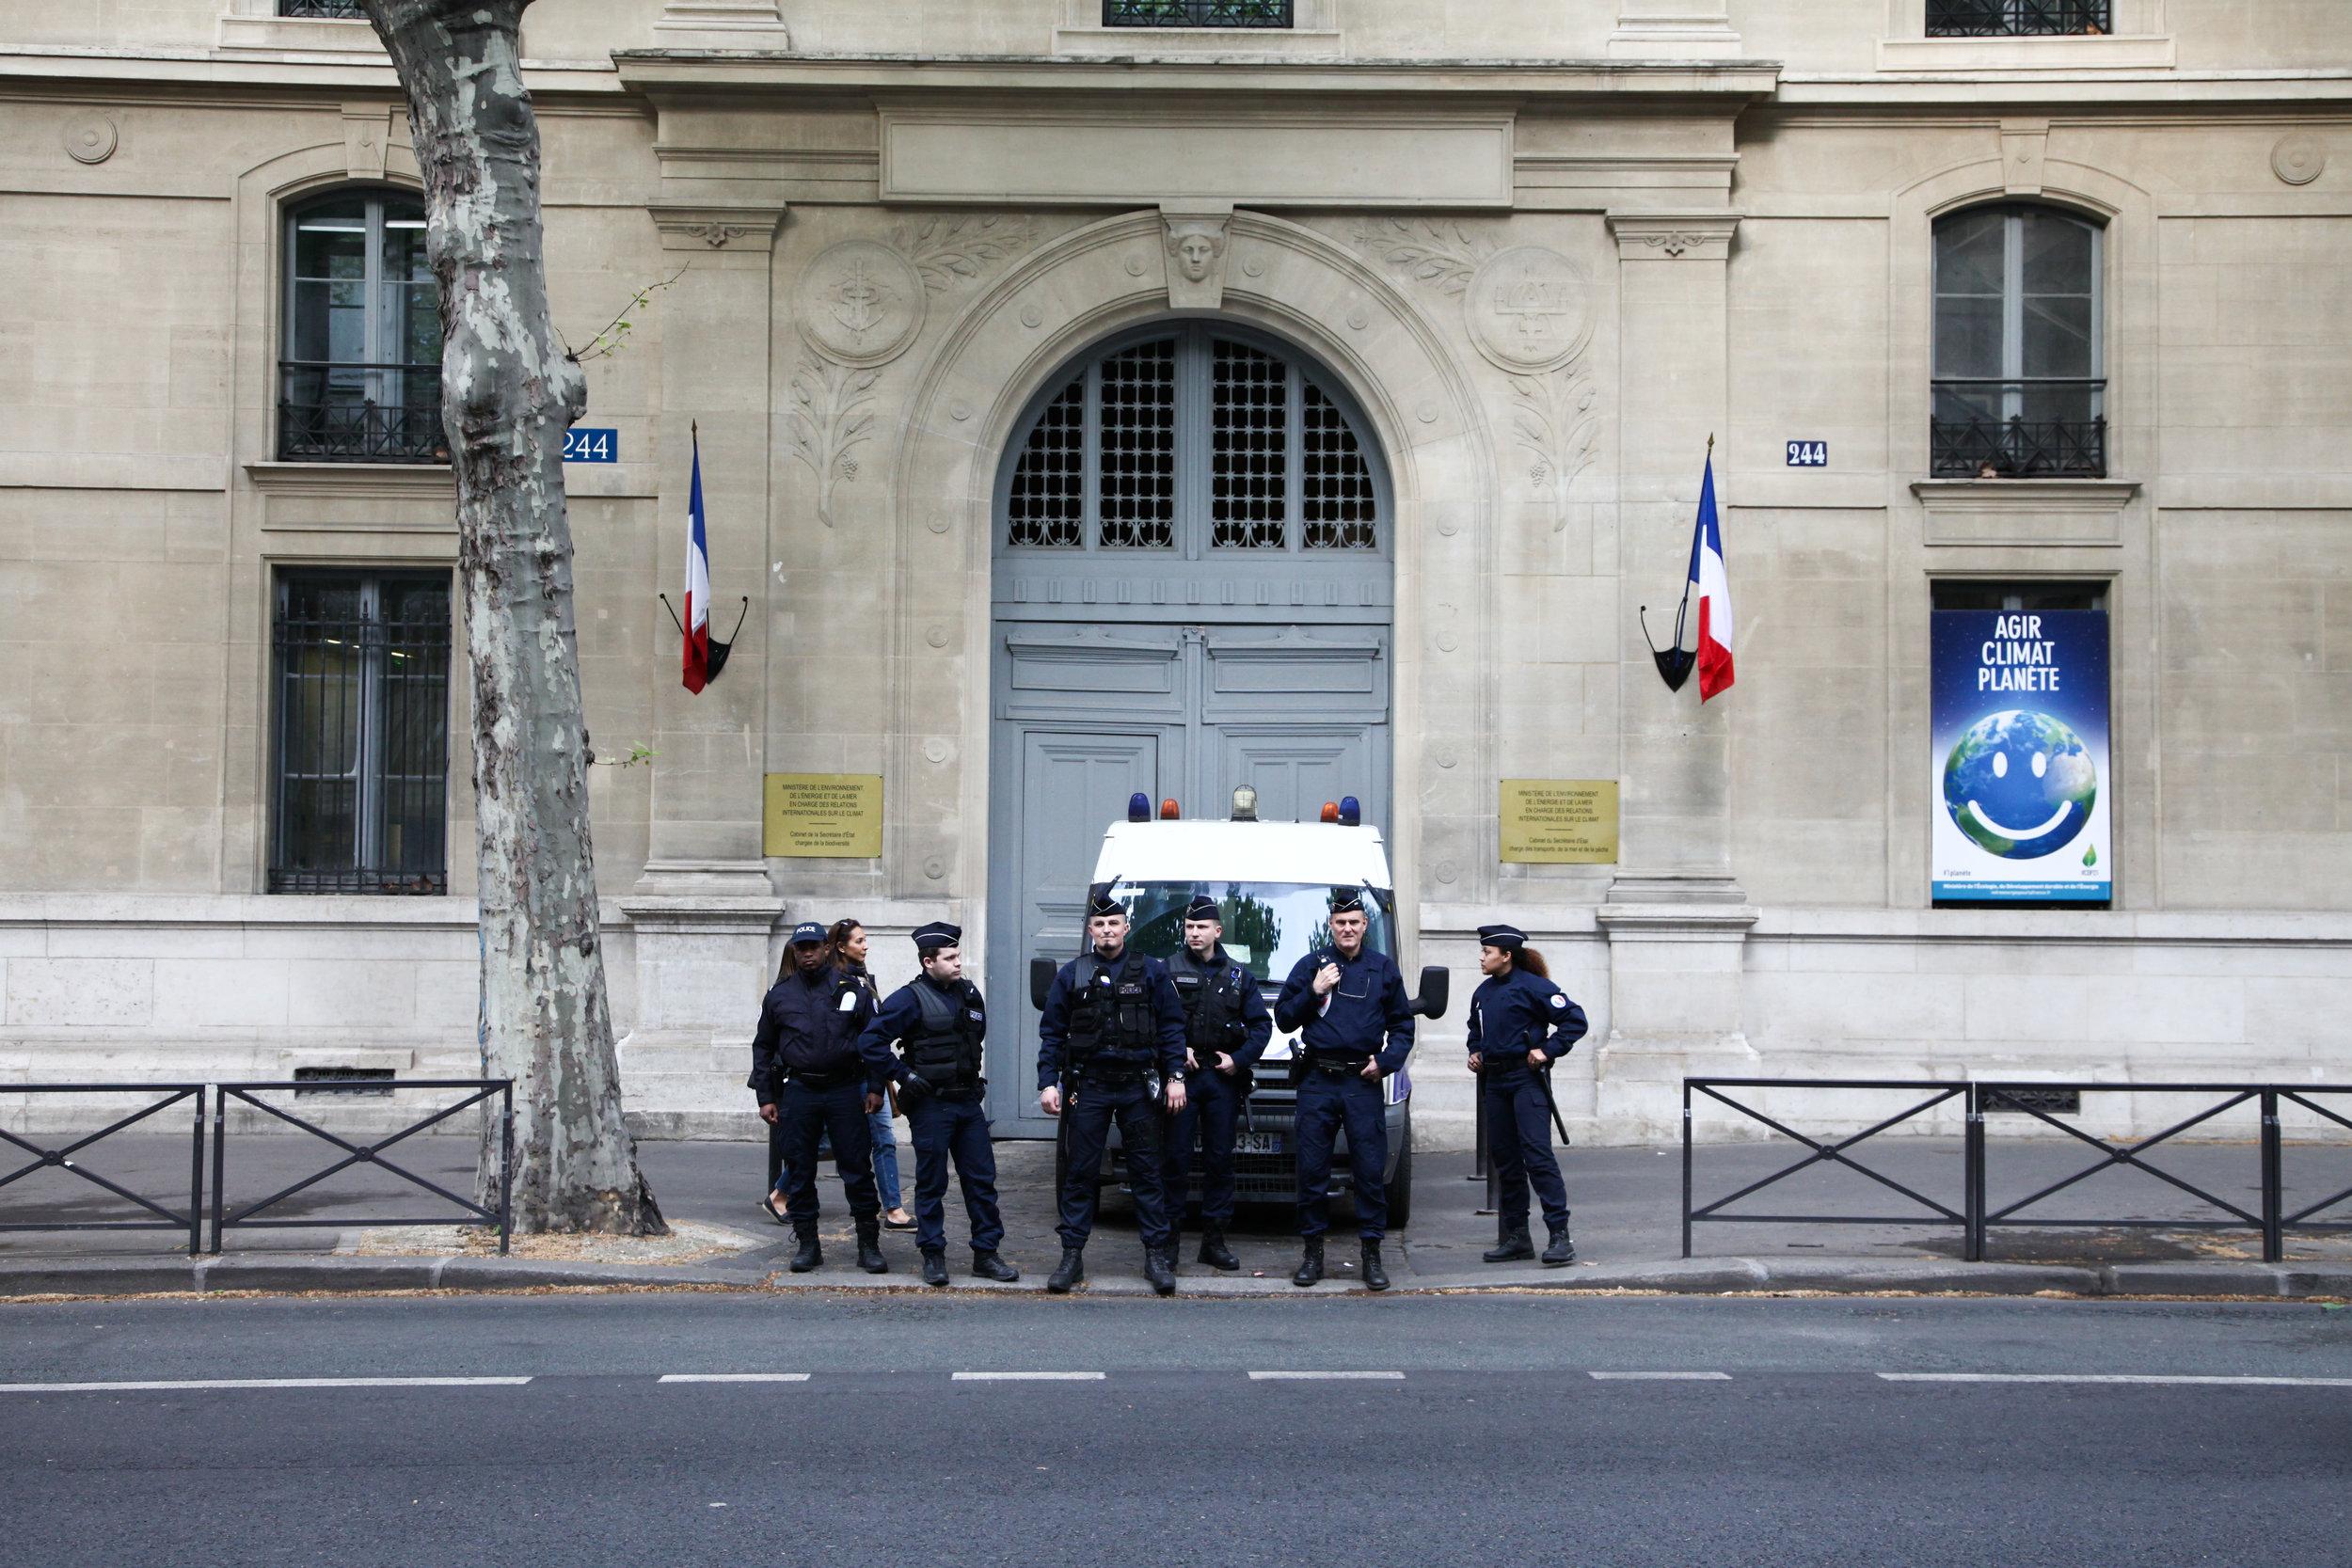 43-20170415-MANIFESTATION-TAXI-PARIS©Augustin-Le_Gall-Haytham-Pictures-IMG_0593.jpg